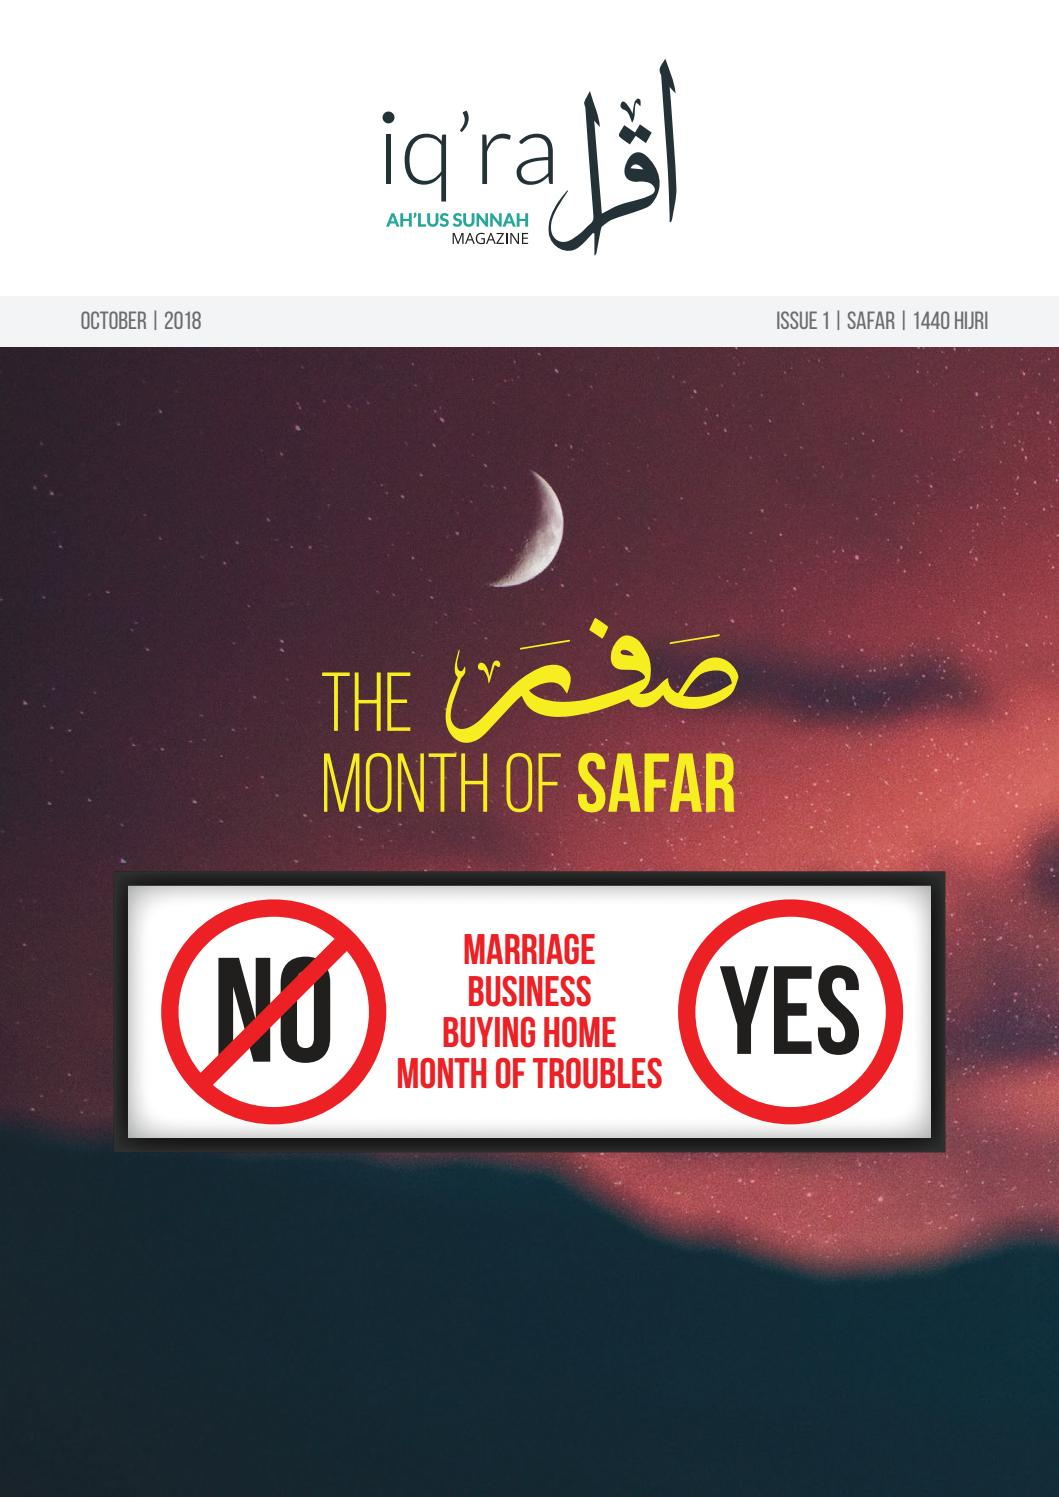 Iqra Ahlus Sunnah Magazine - October | 2018 ISSUE 1 | SAFAR